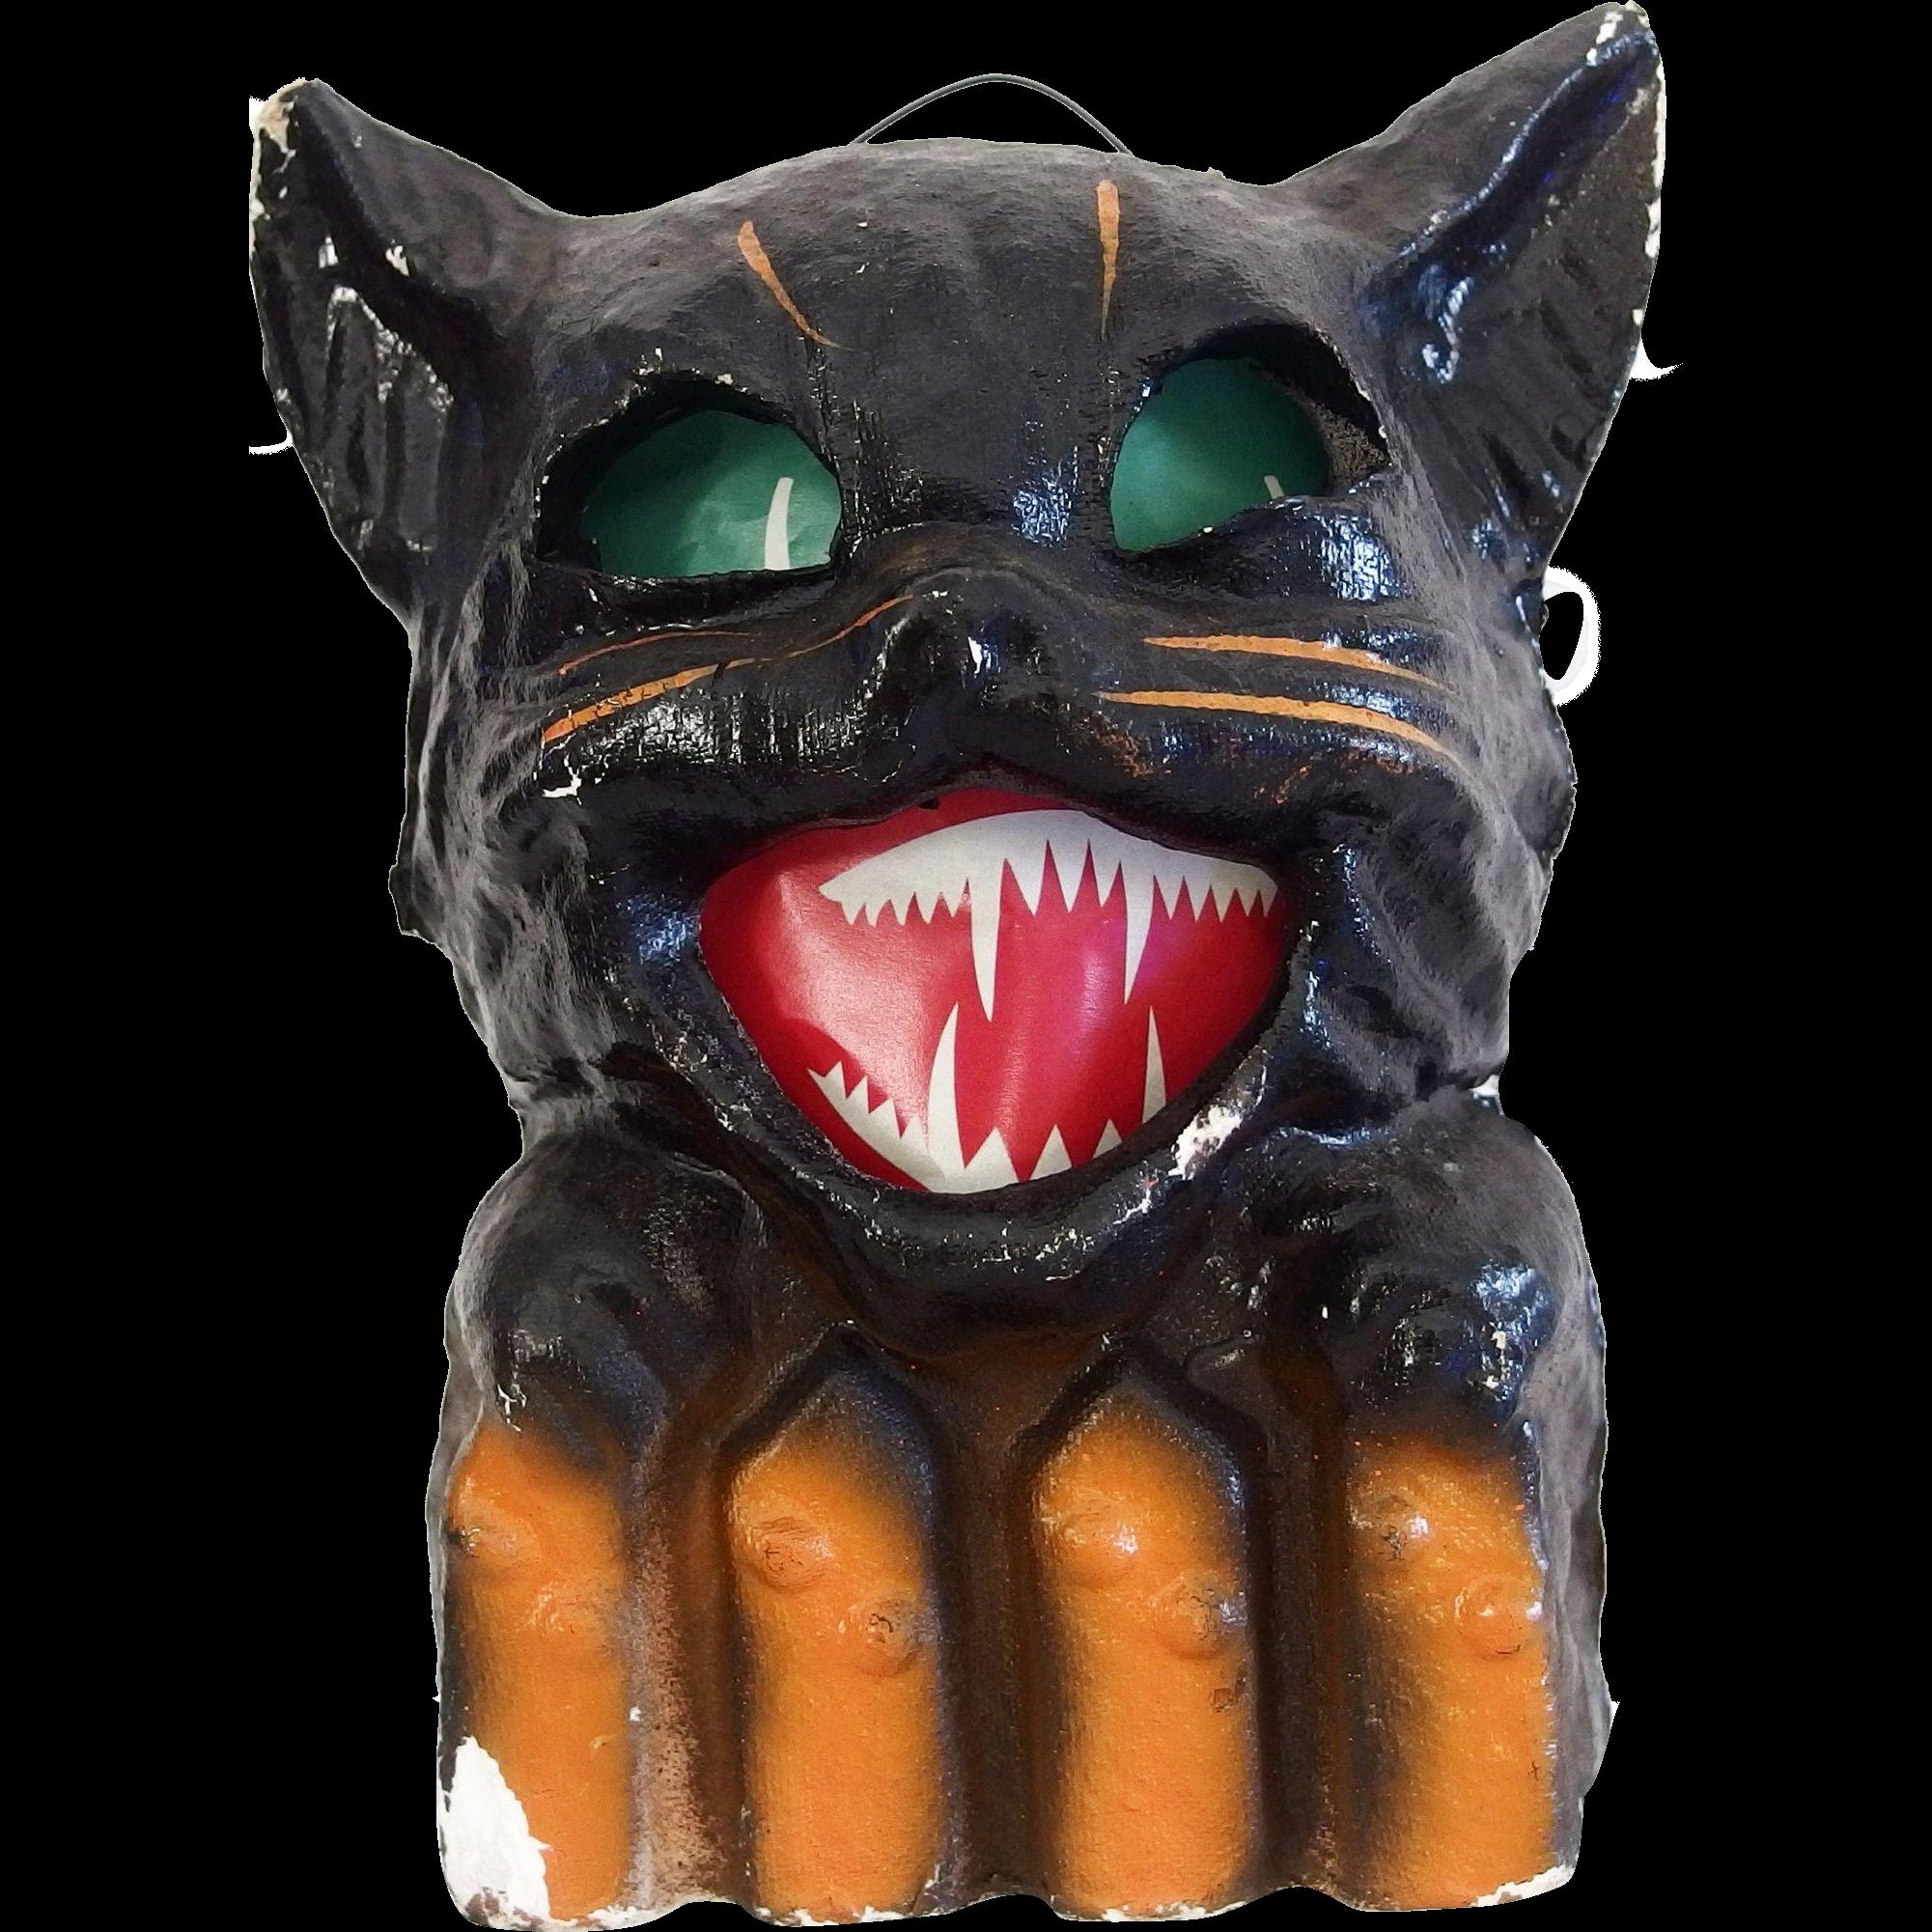 Vintage halloween paper decorations - Halloween Decoration Pulp Paper Mache Black Cat On Fence Jack O Lantern Usa 1930s